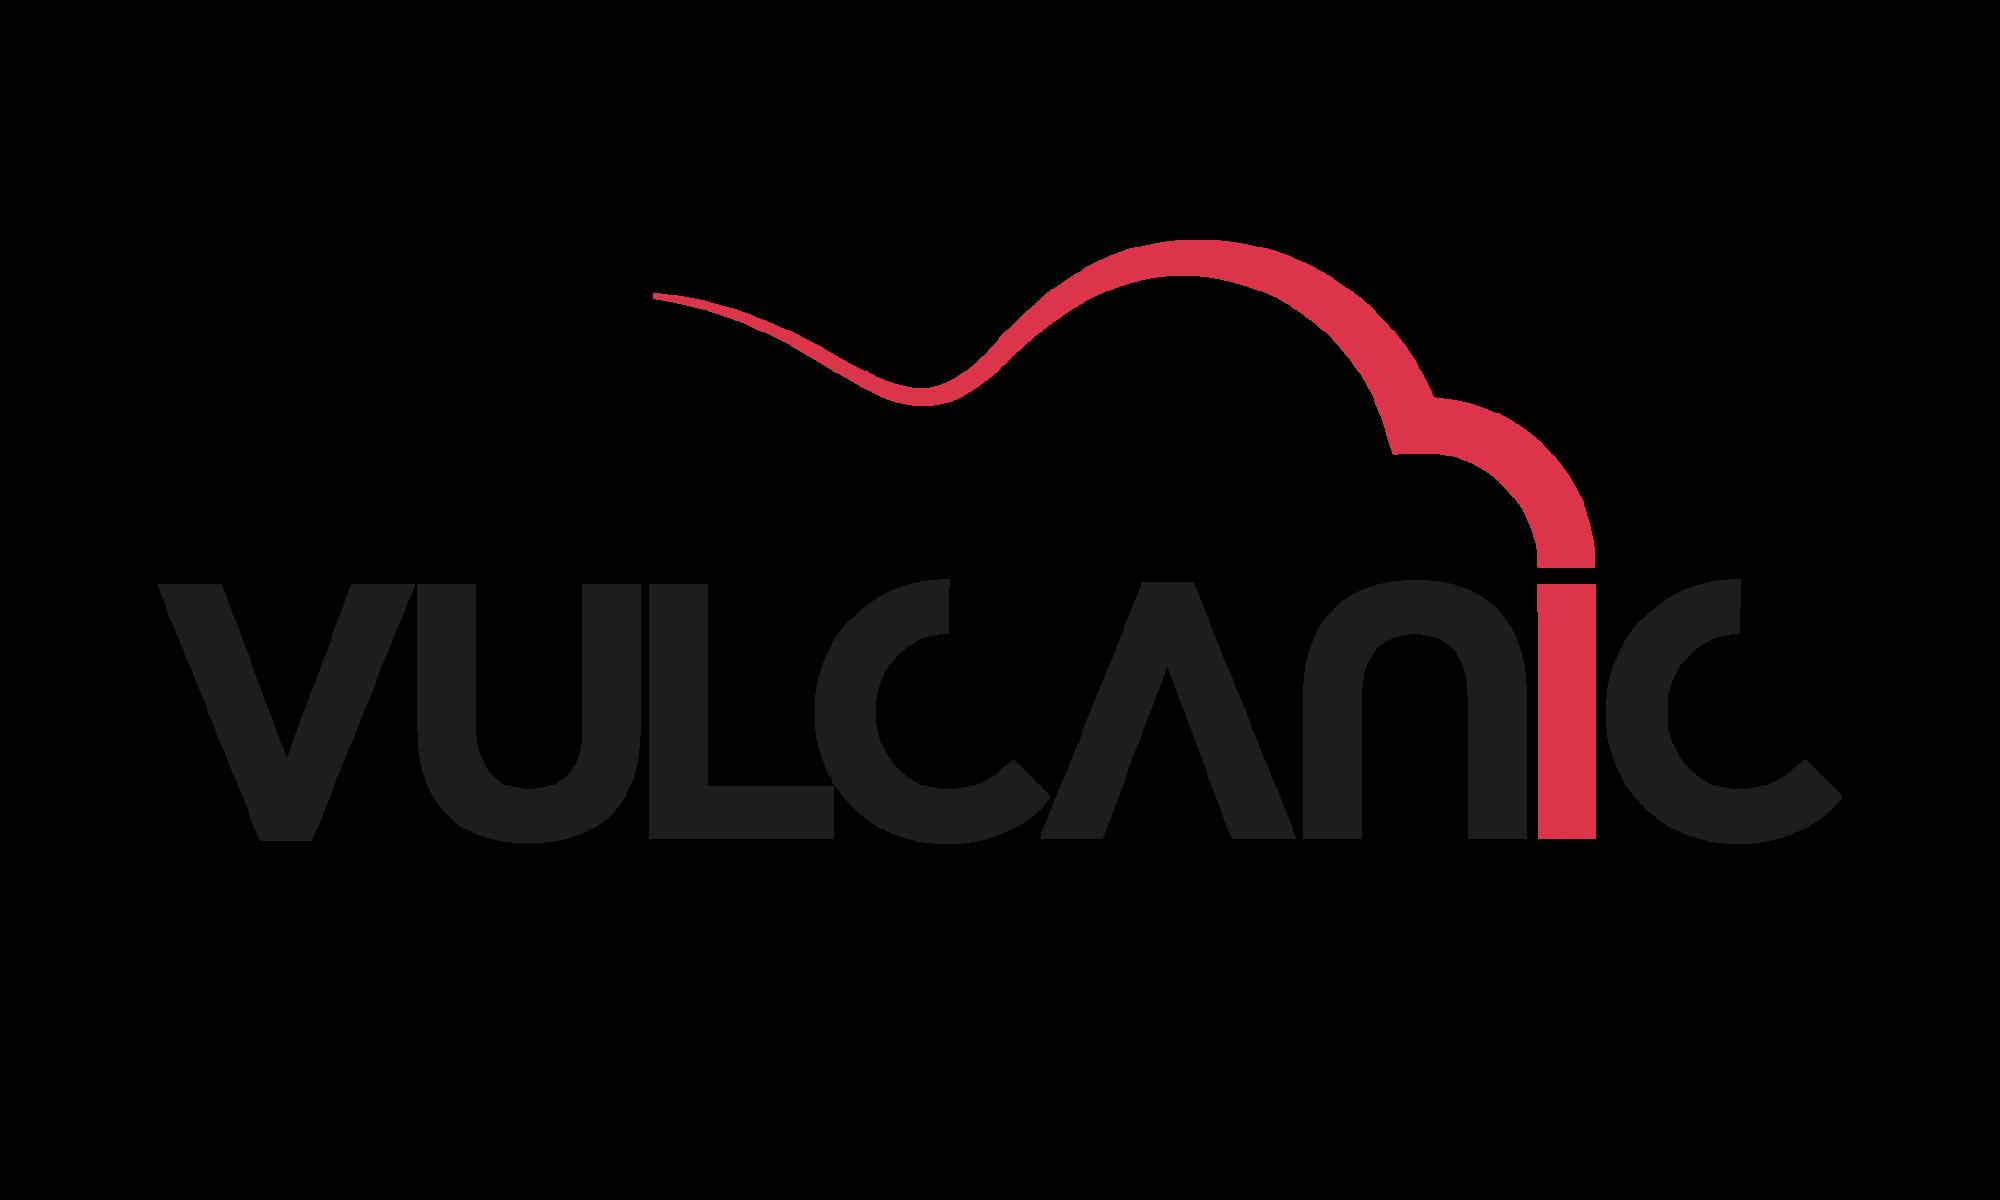 Logo Vulcanic - incubatole d'impresa a Catania